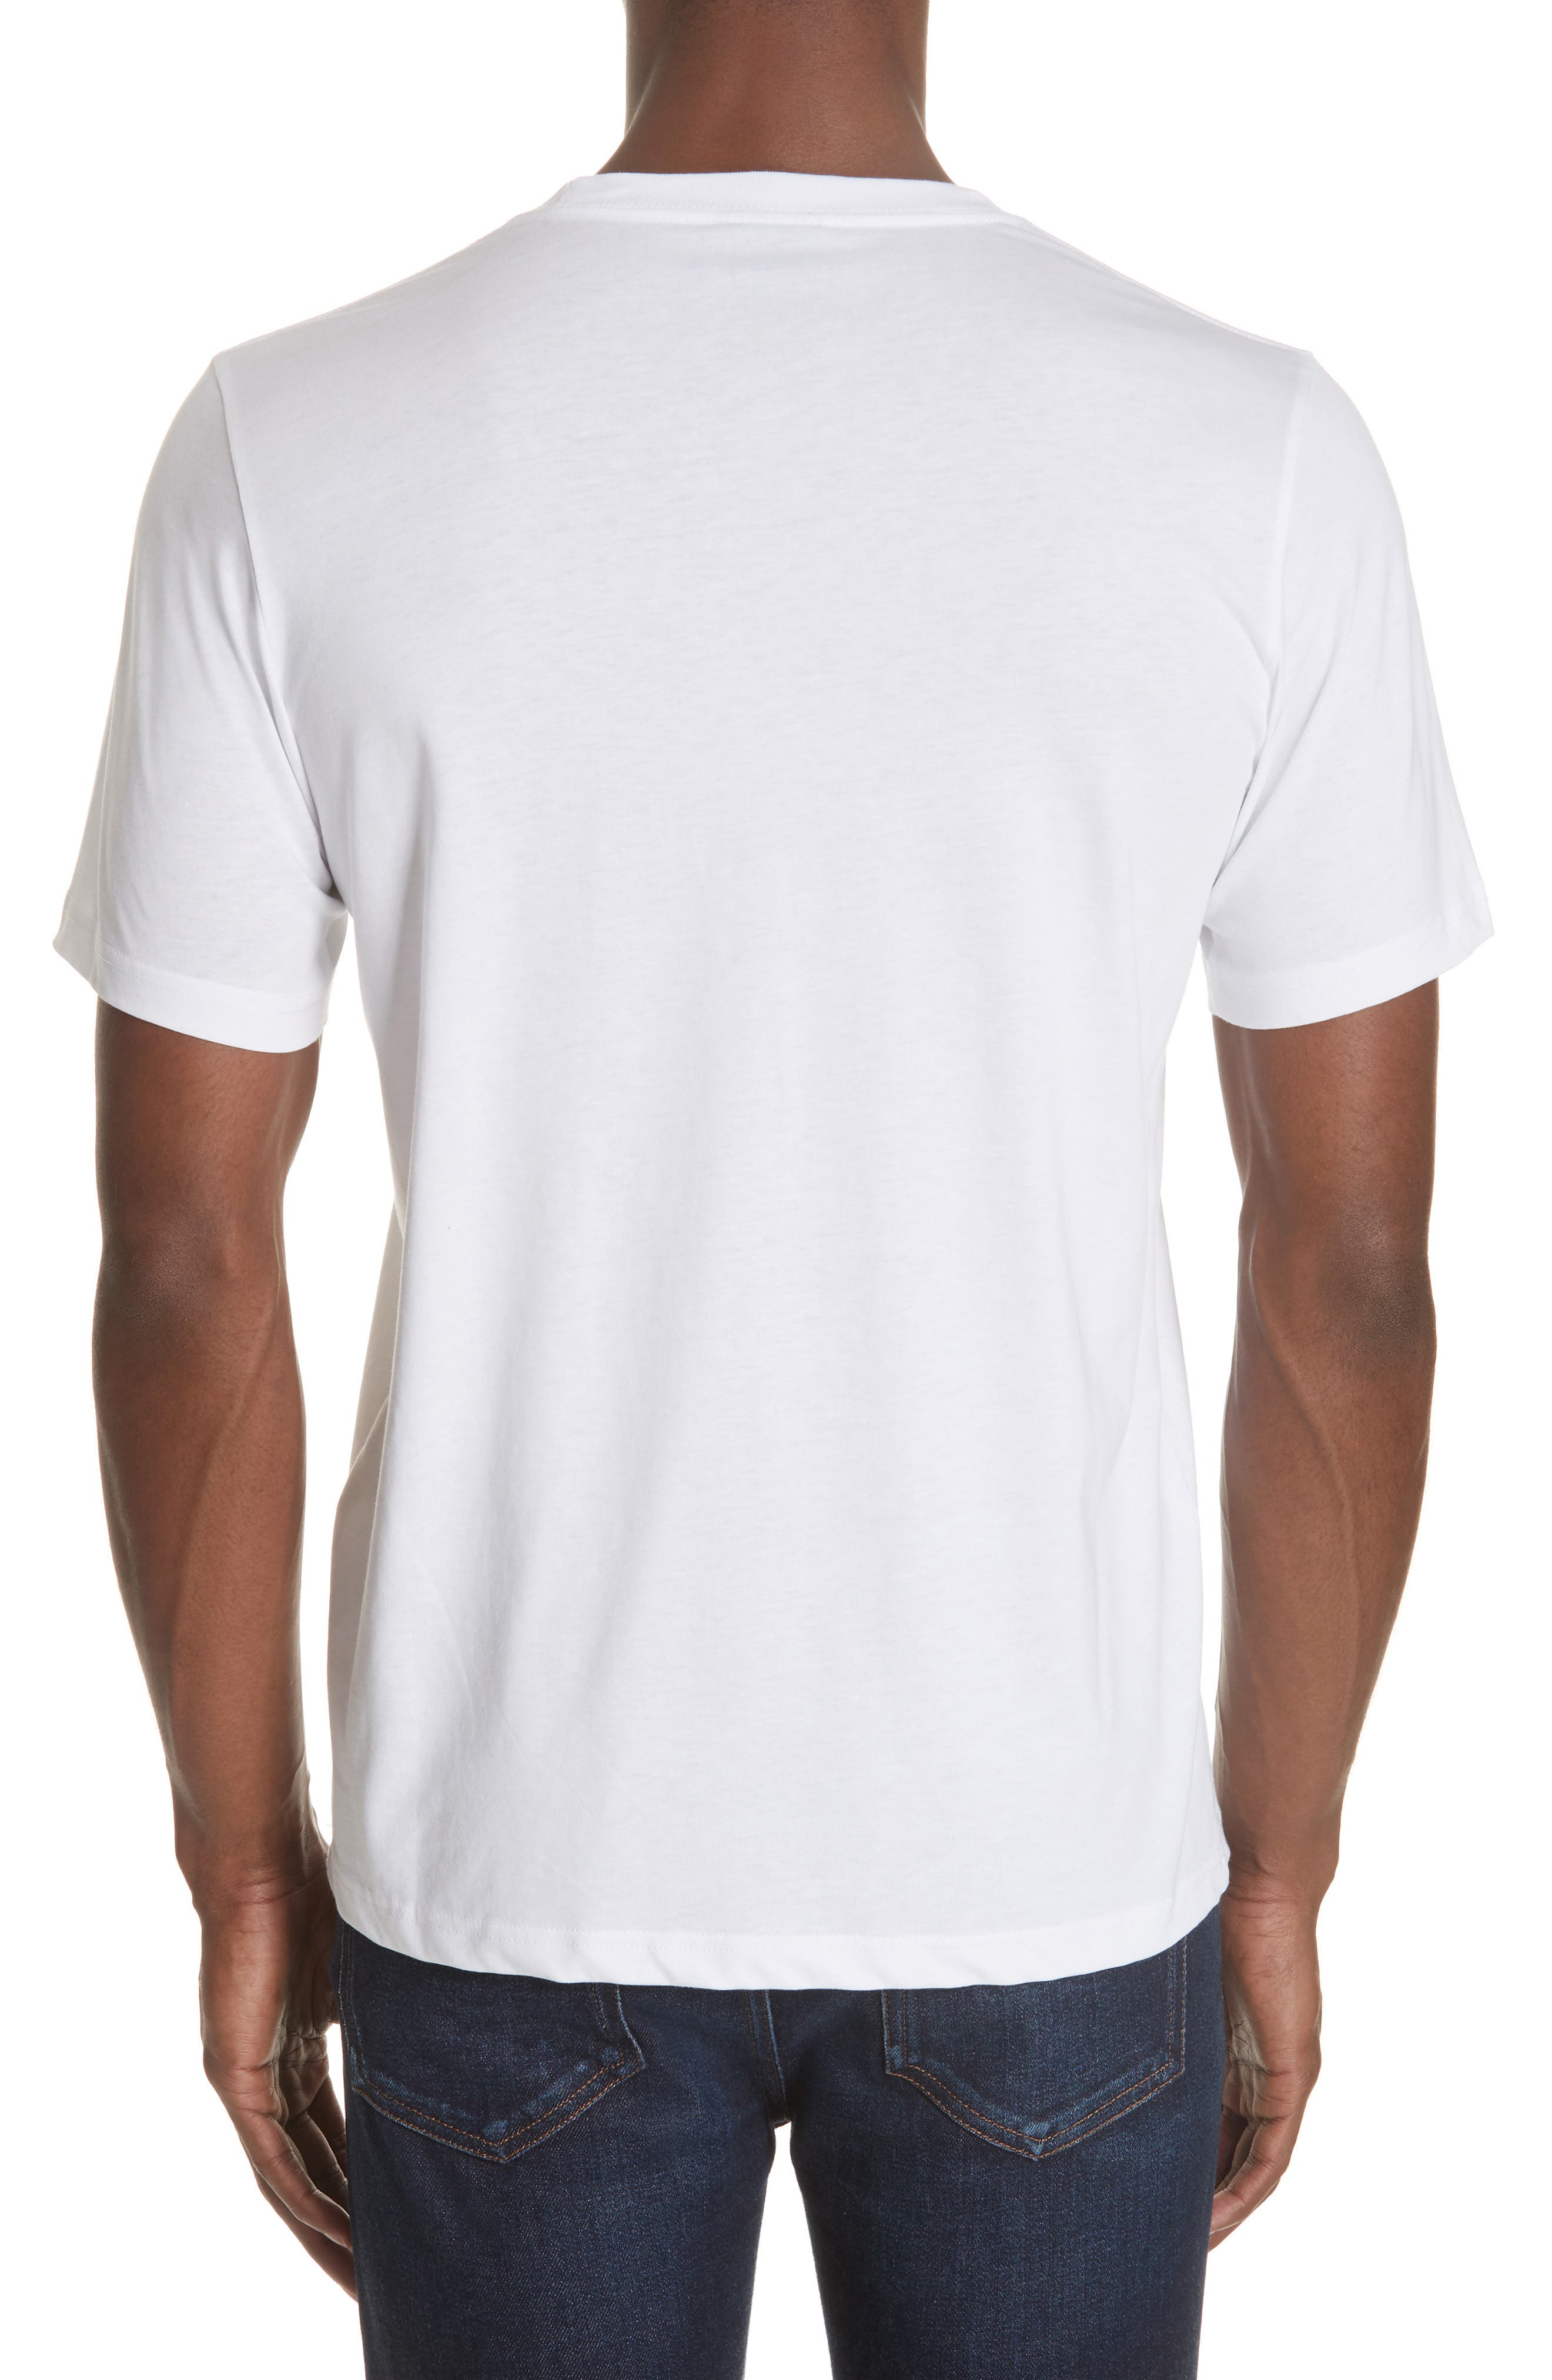 PS PAUL SMITH,                             Shipwreck Graphic T-Shirt,                             Alternate thumbnail 2, color,                             100